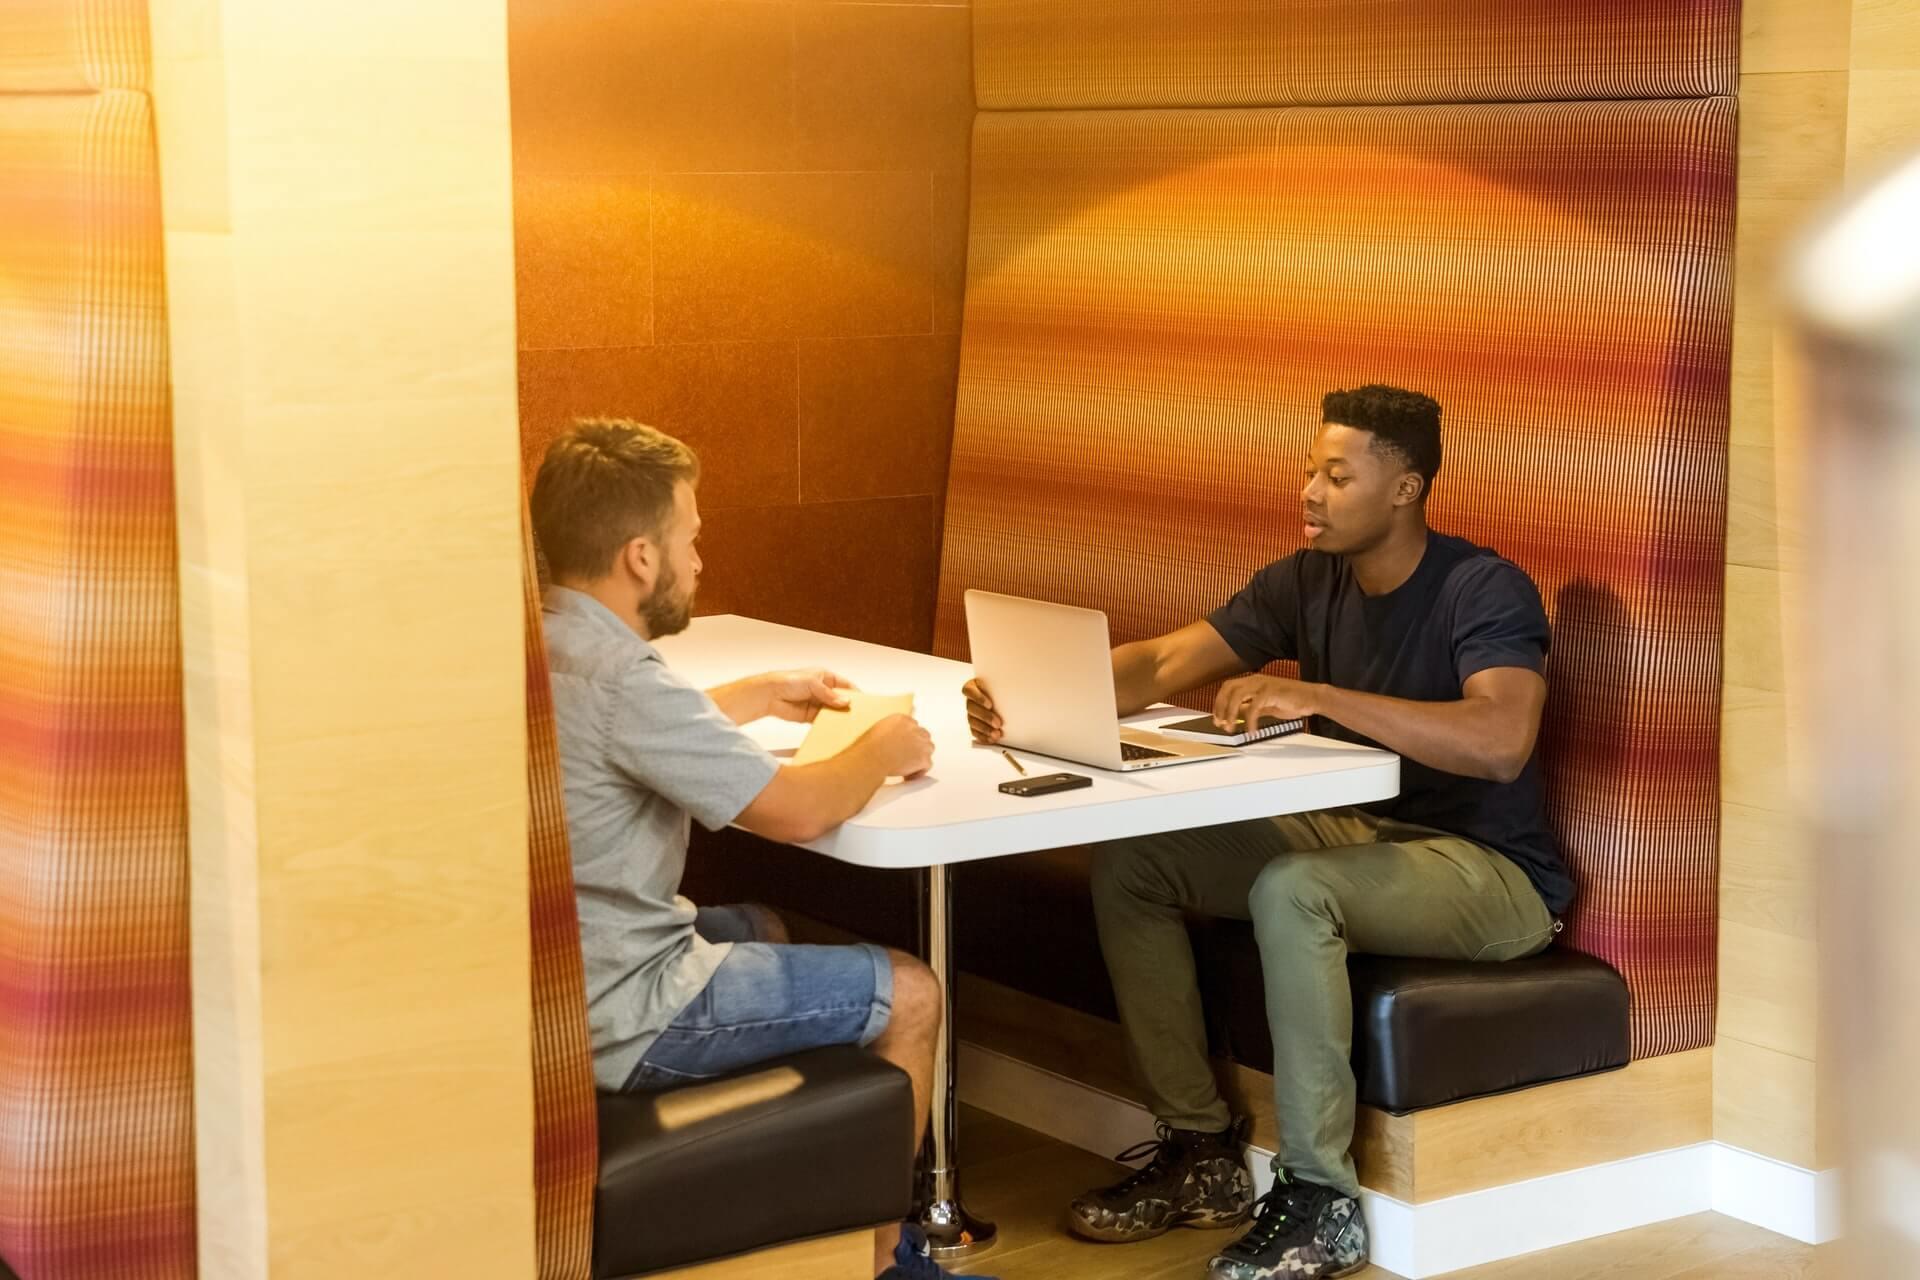 8 Best Online Customer Service Conversational AI Software Platforms in 2021